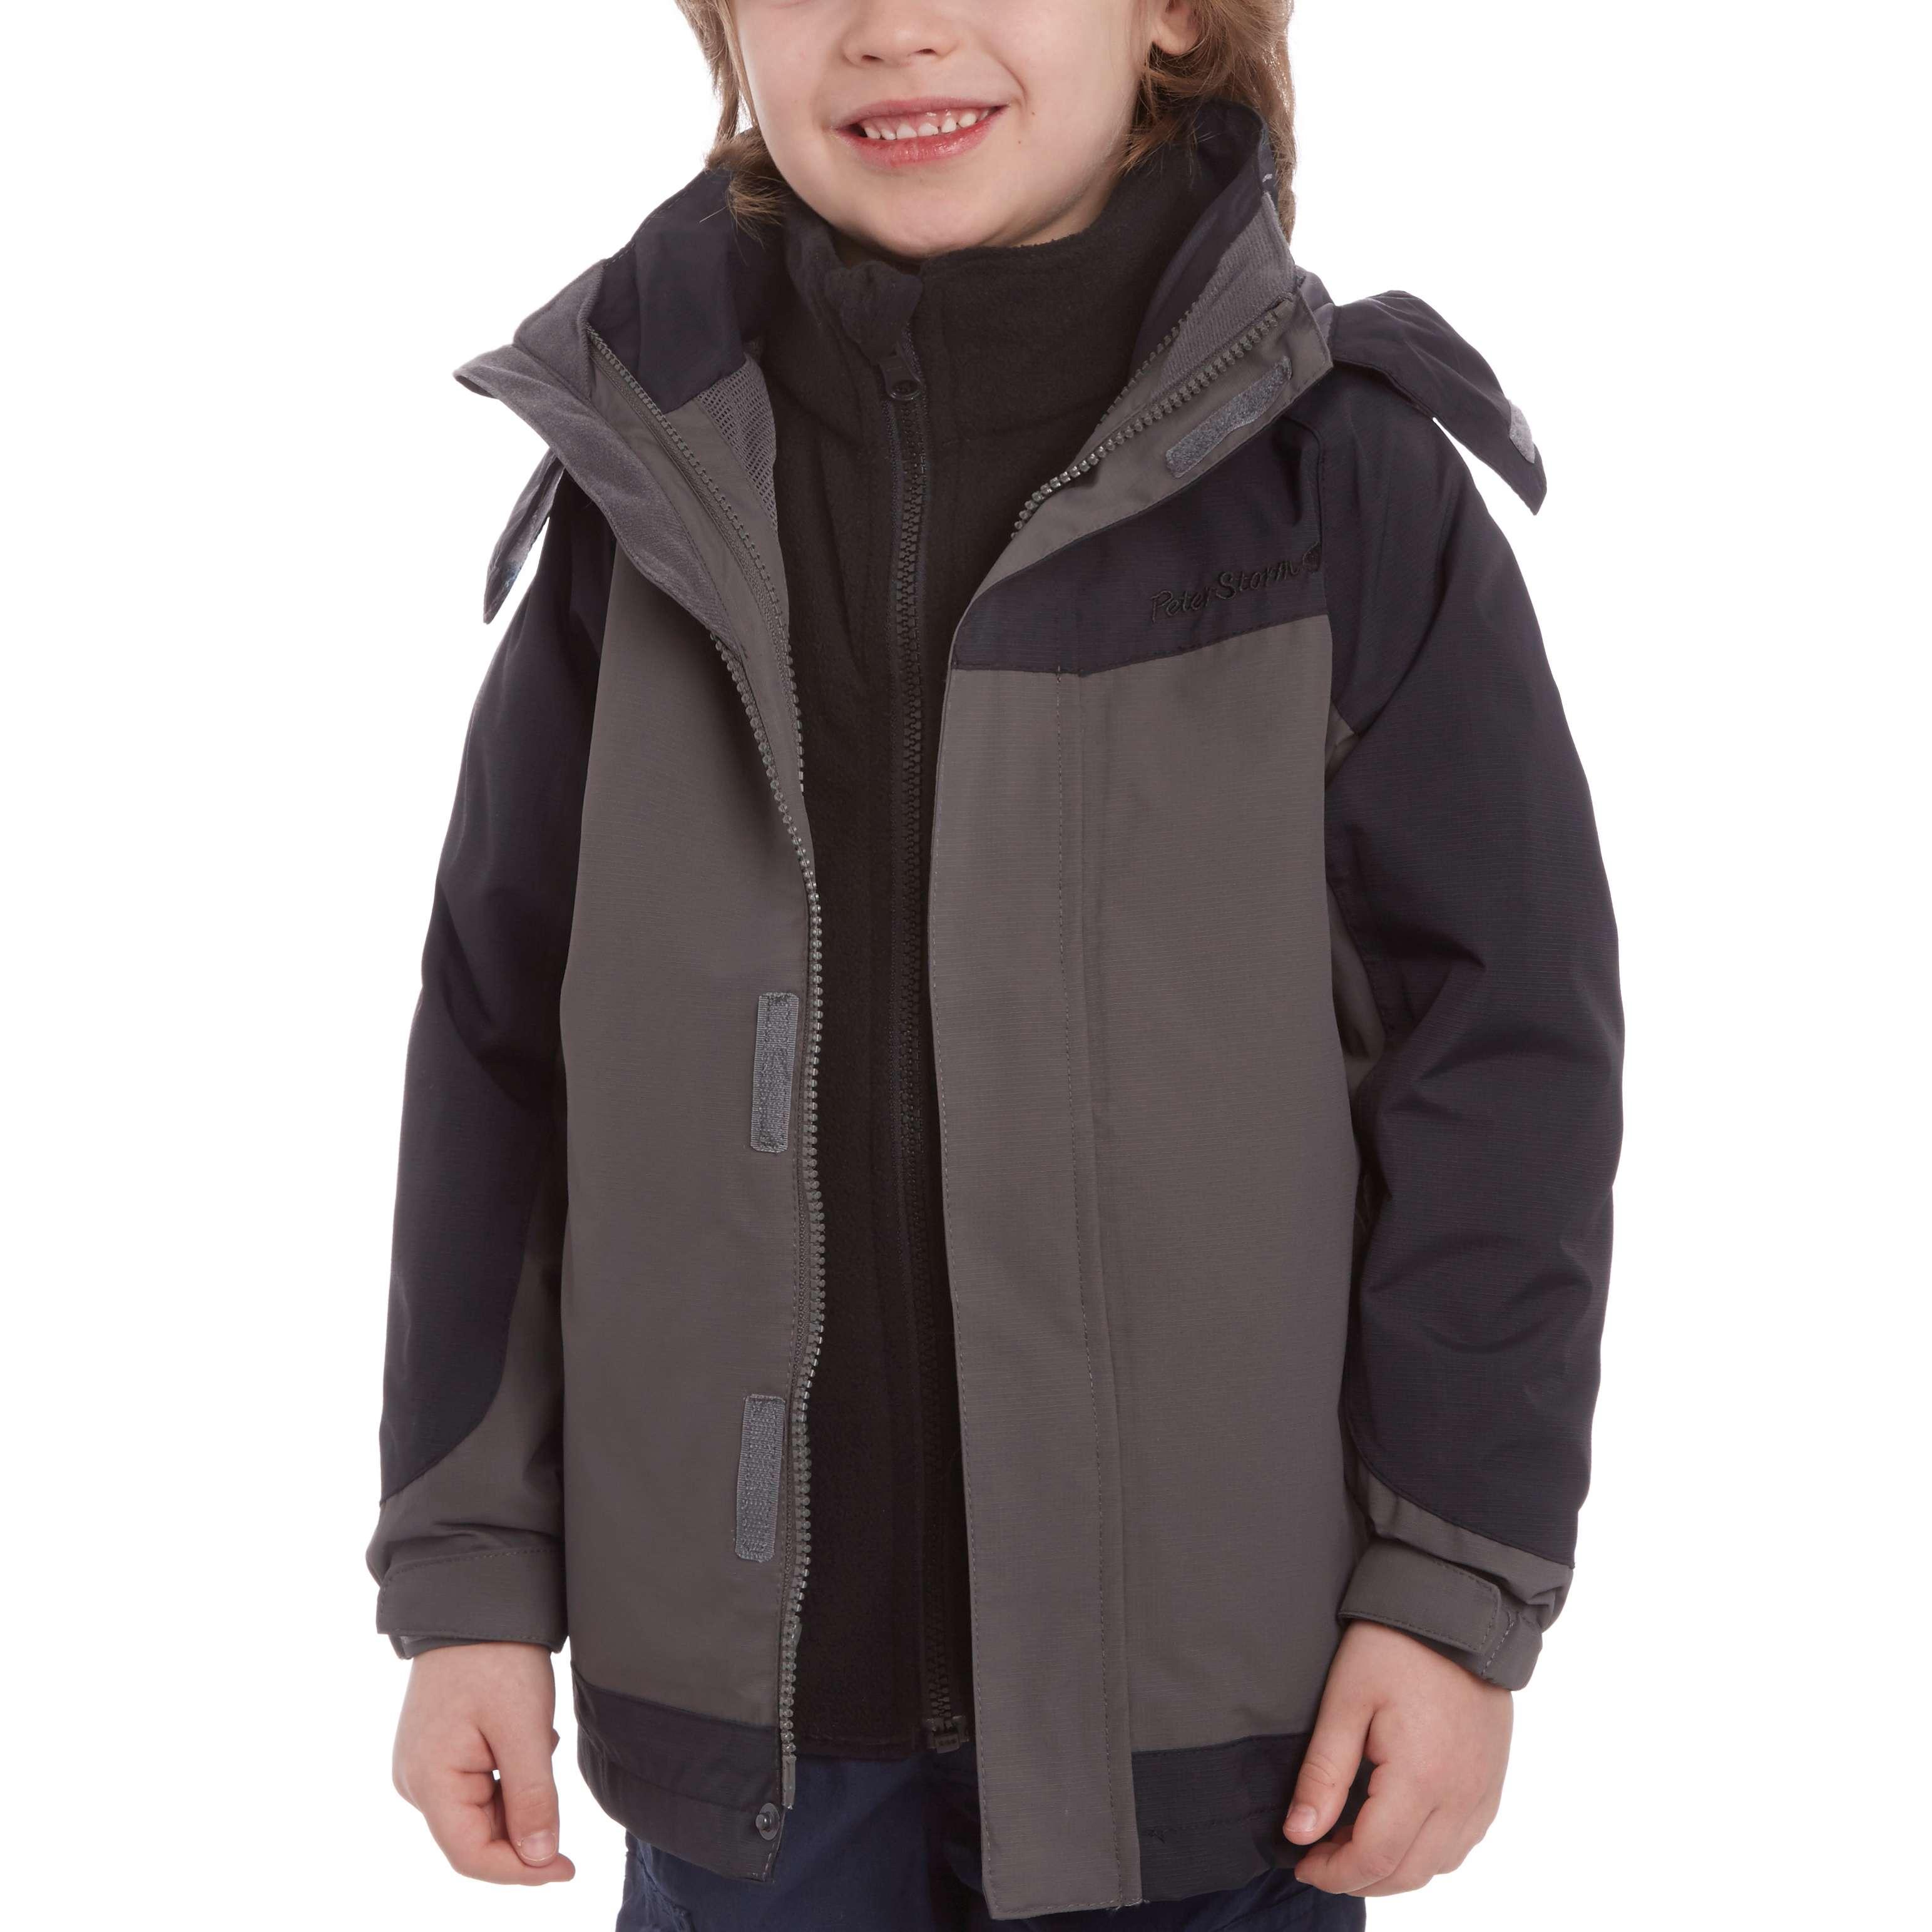 PETER STORM Boys' 3 in 1 Jacket